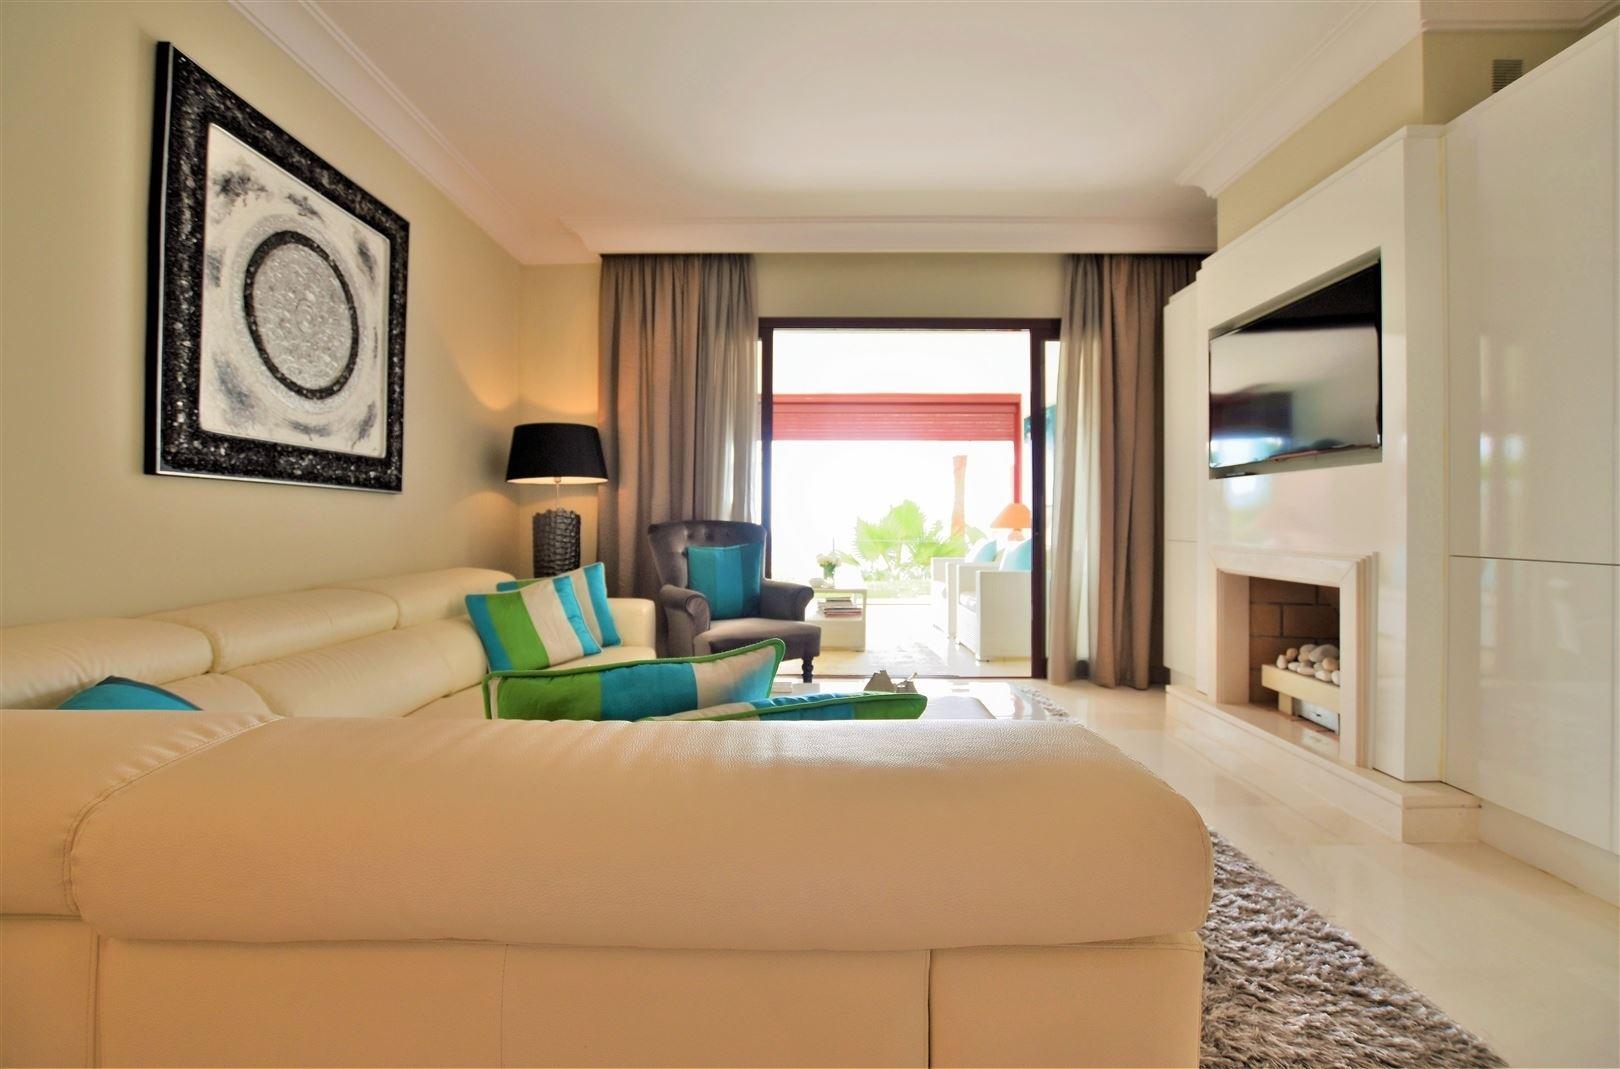 Foto 8 : Appartement te 29679 MARBELLA (Spanje) - Prijs € 1.750